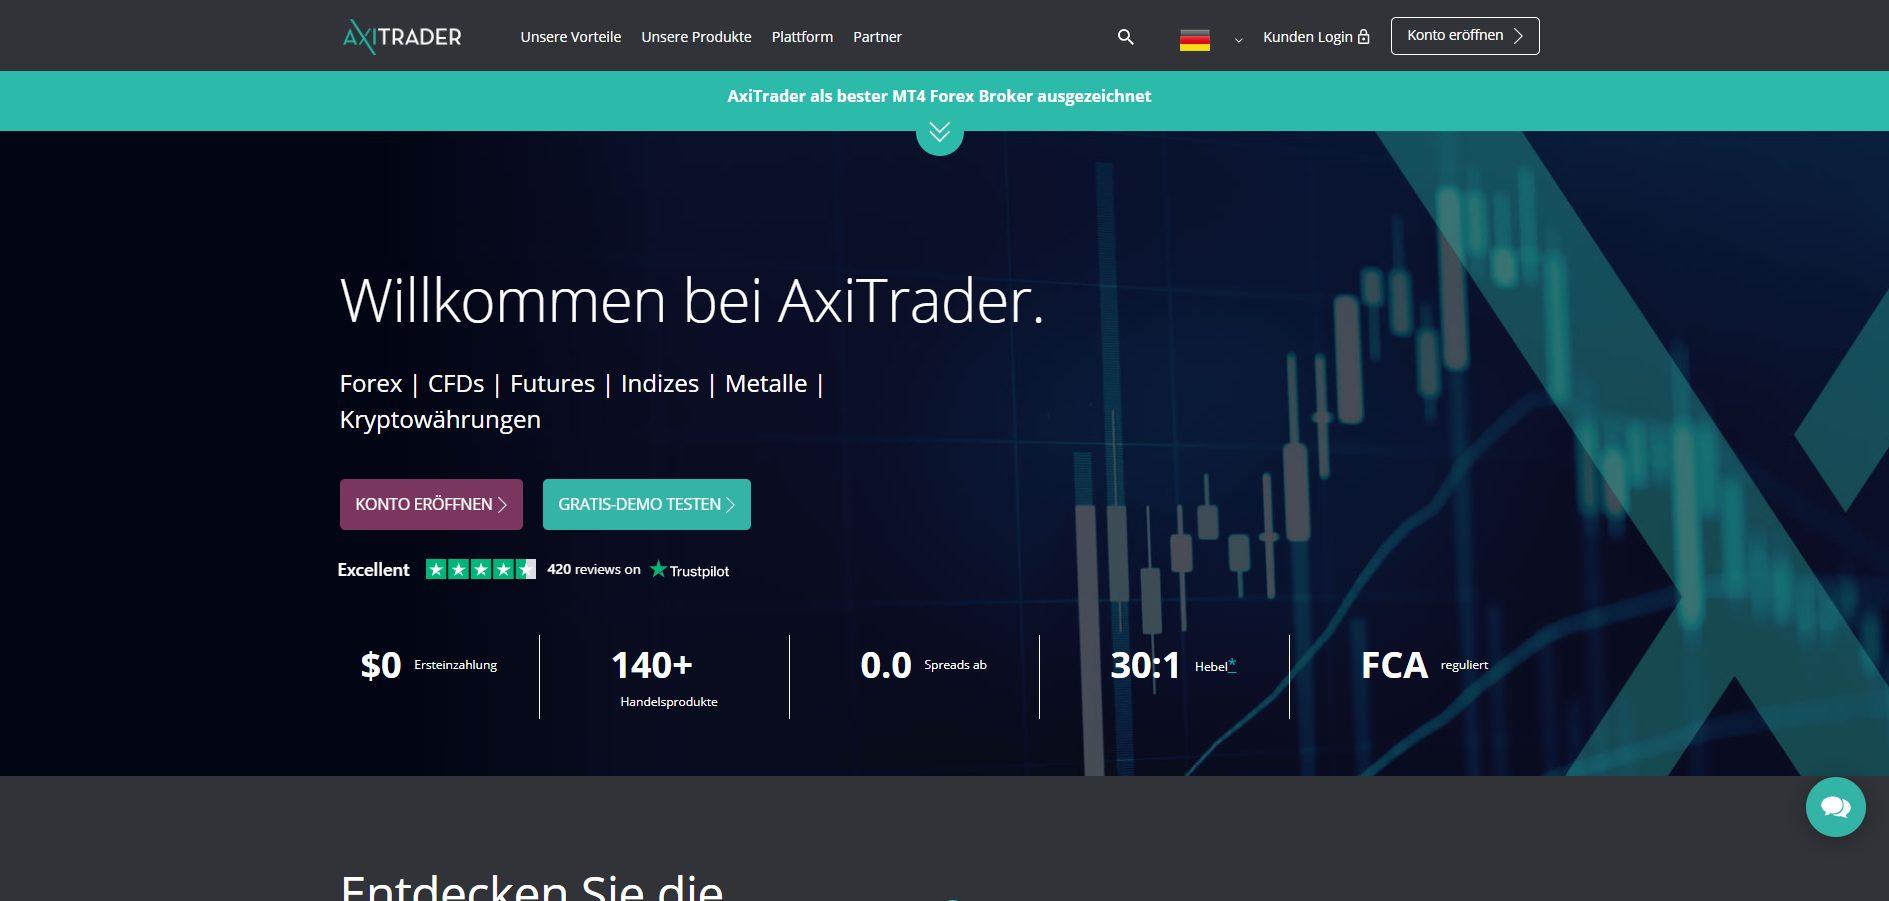 Screenthost der AxiTrader Webseite